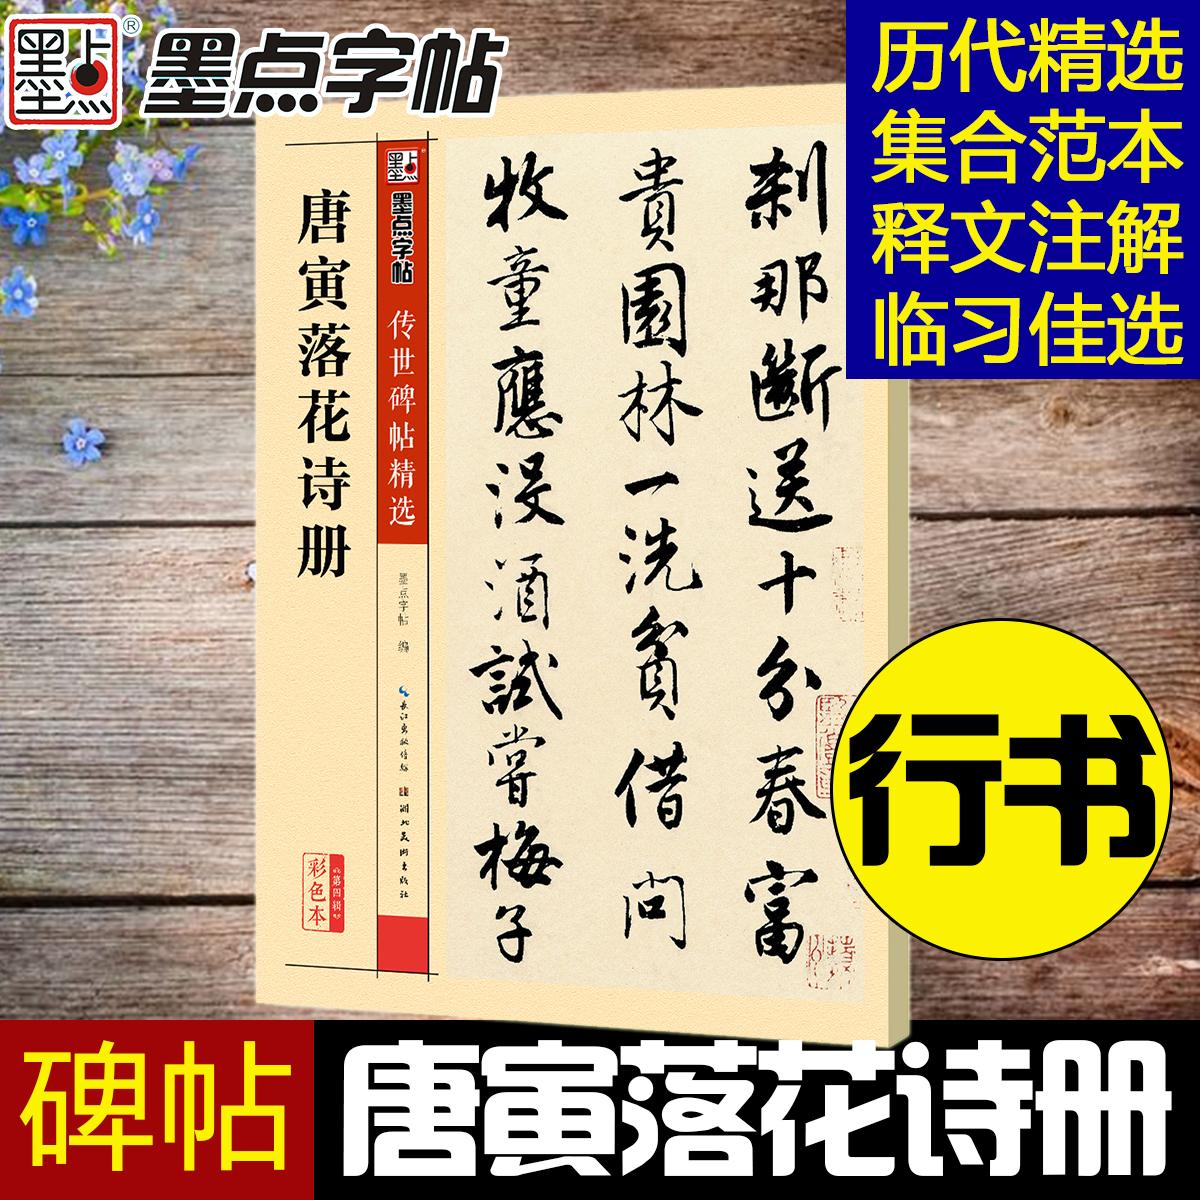 Китайские прописи Артикул 527901461990